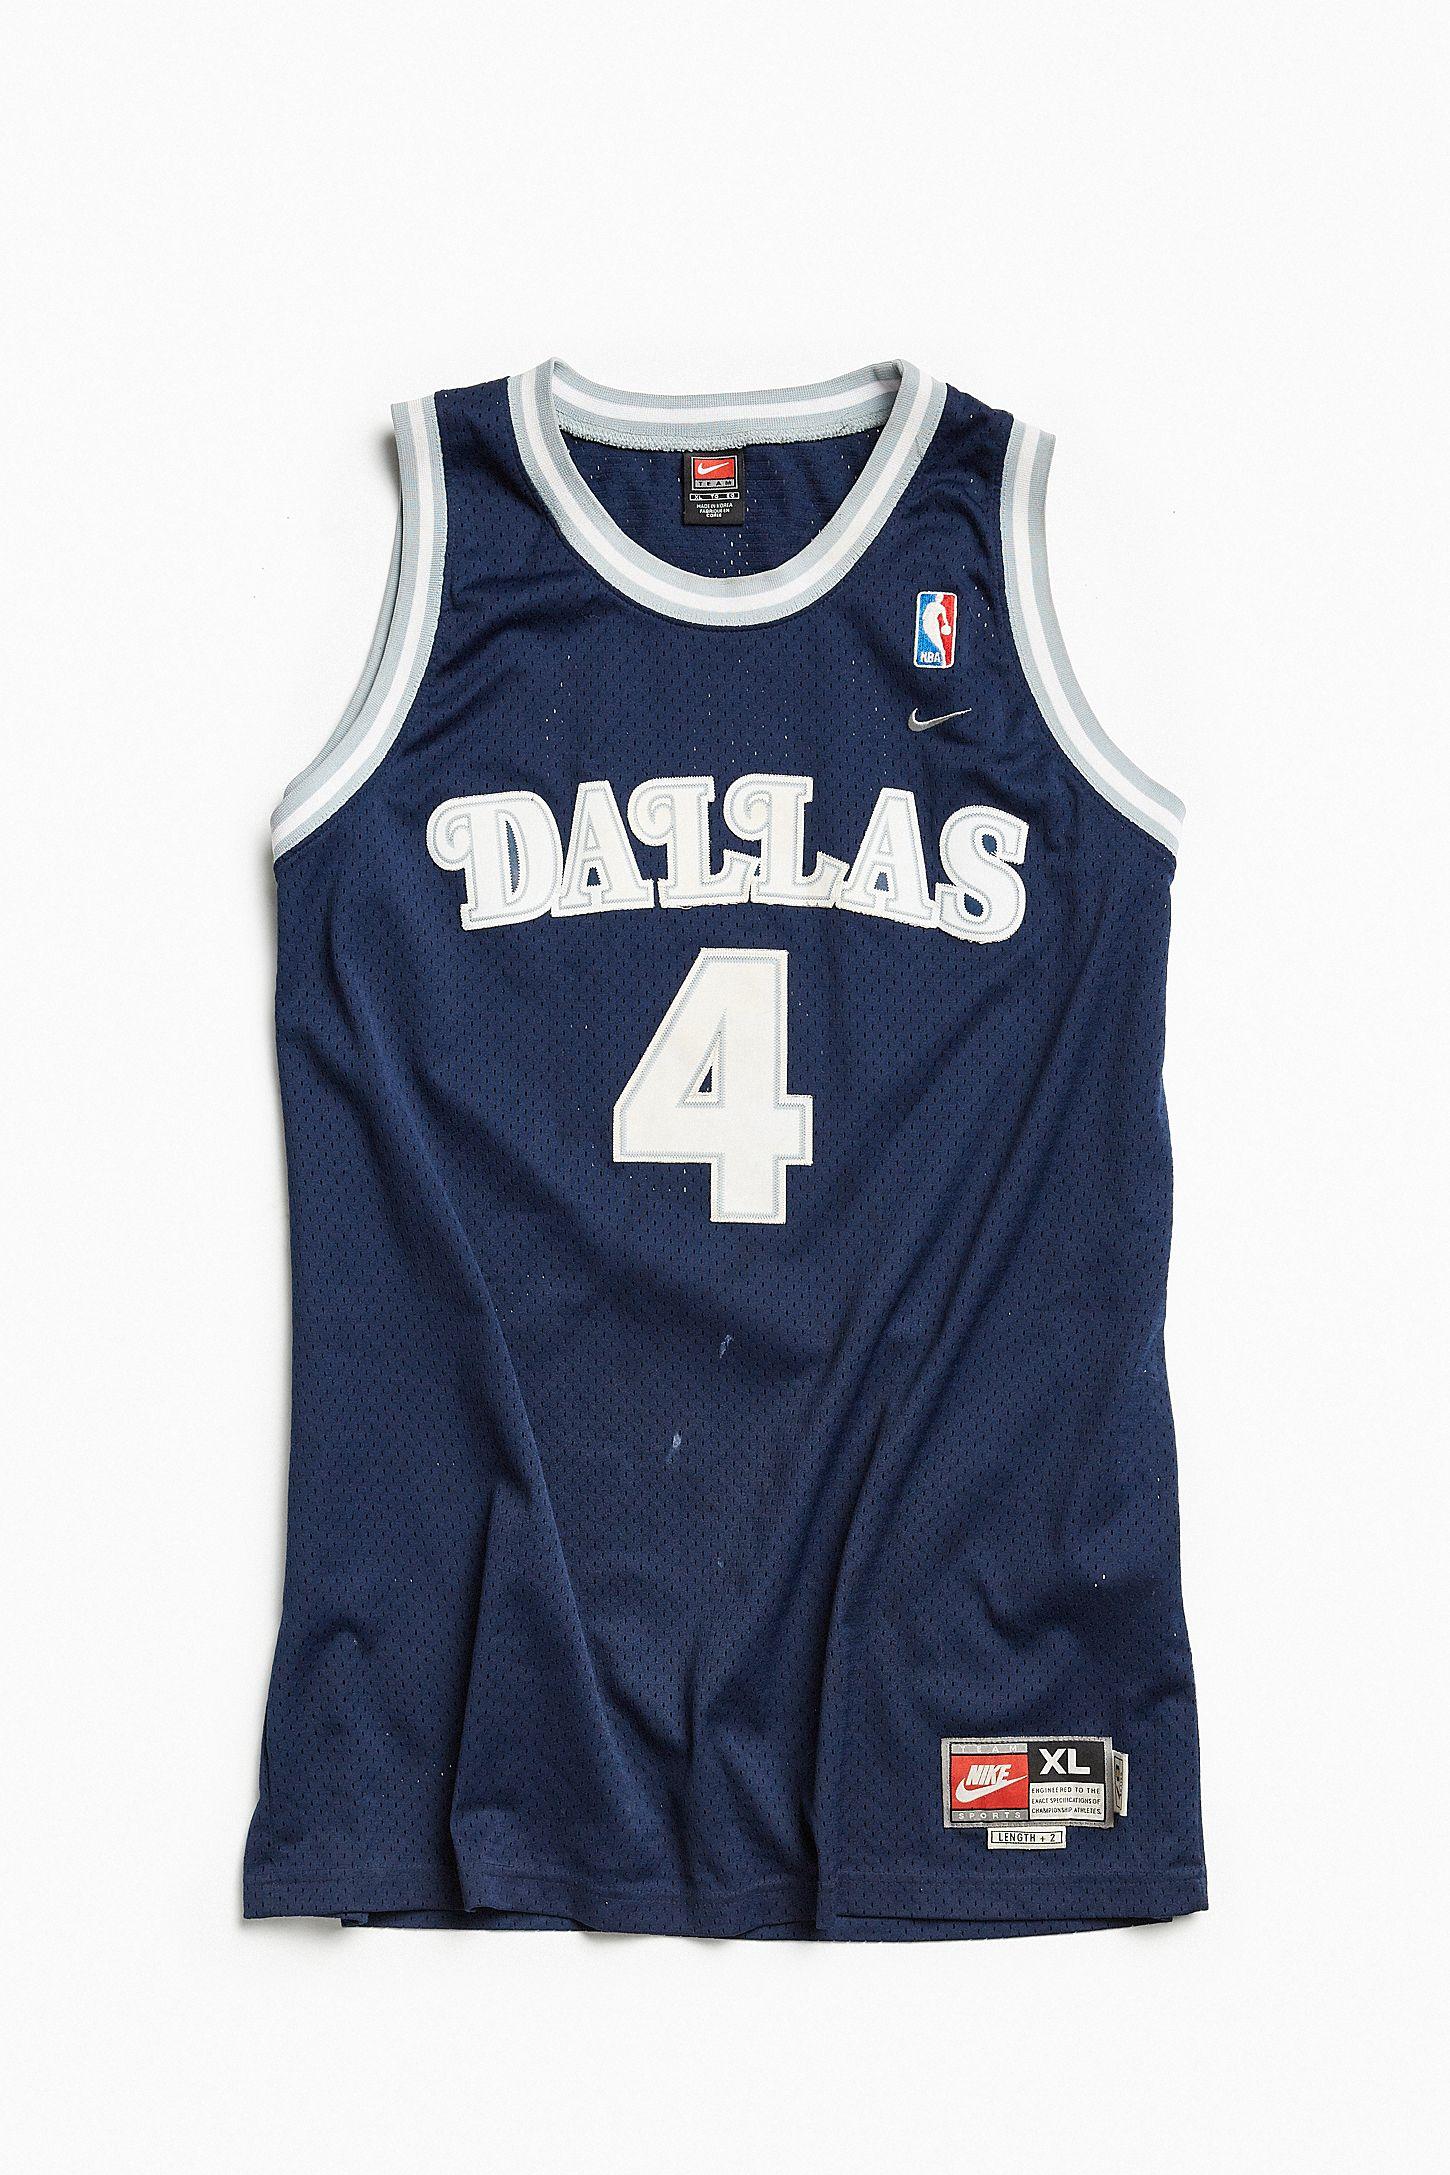 b35510702ec5 Vintage Nike Michael Finley Dallas Mavericks Basketball Jersey ...